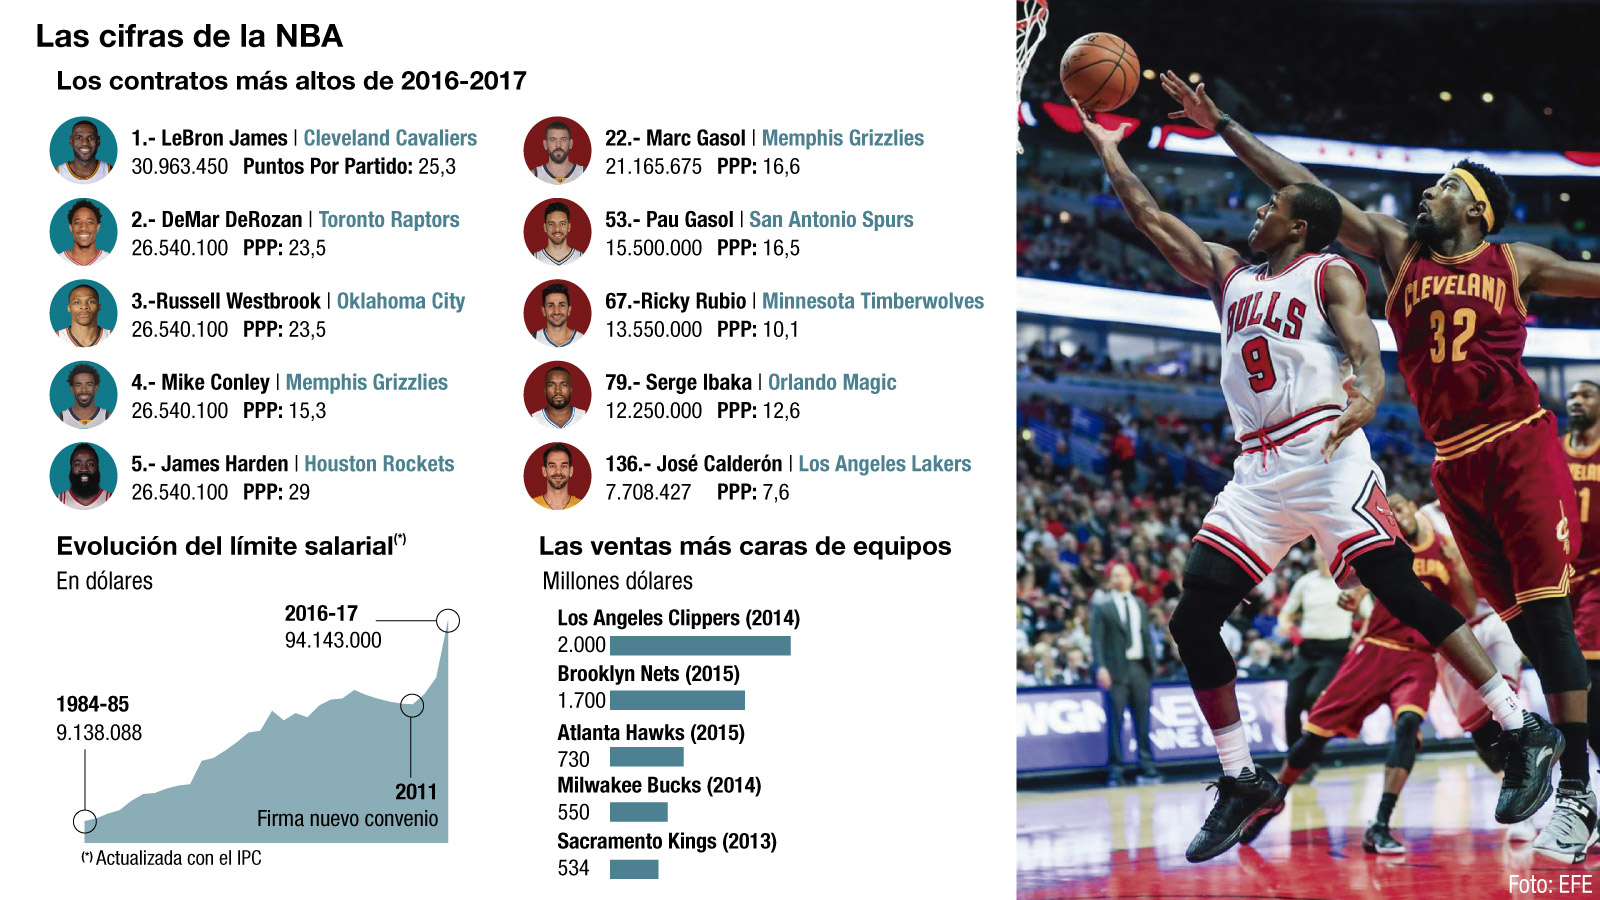 Fuente: Basketball Reference / NBA